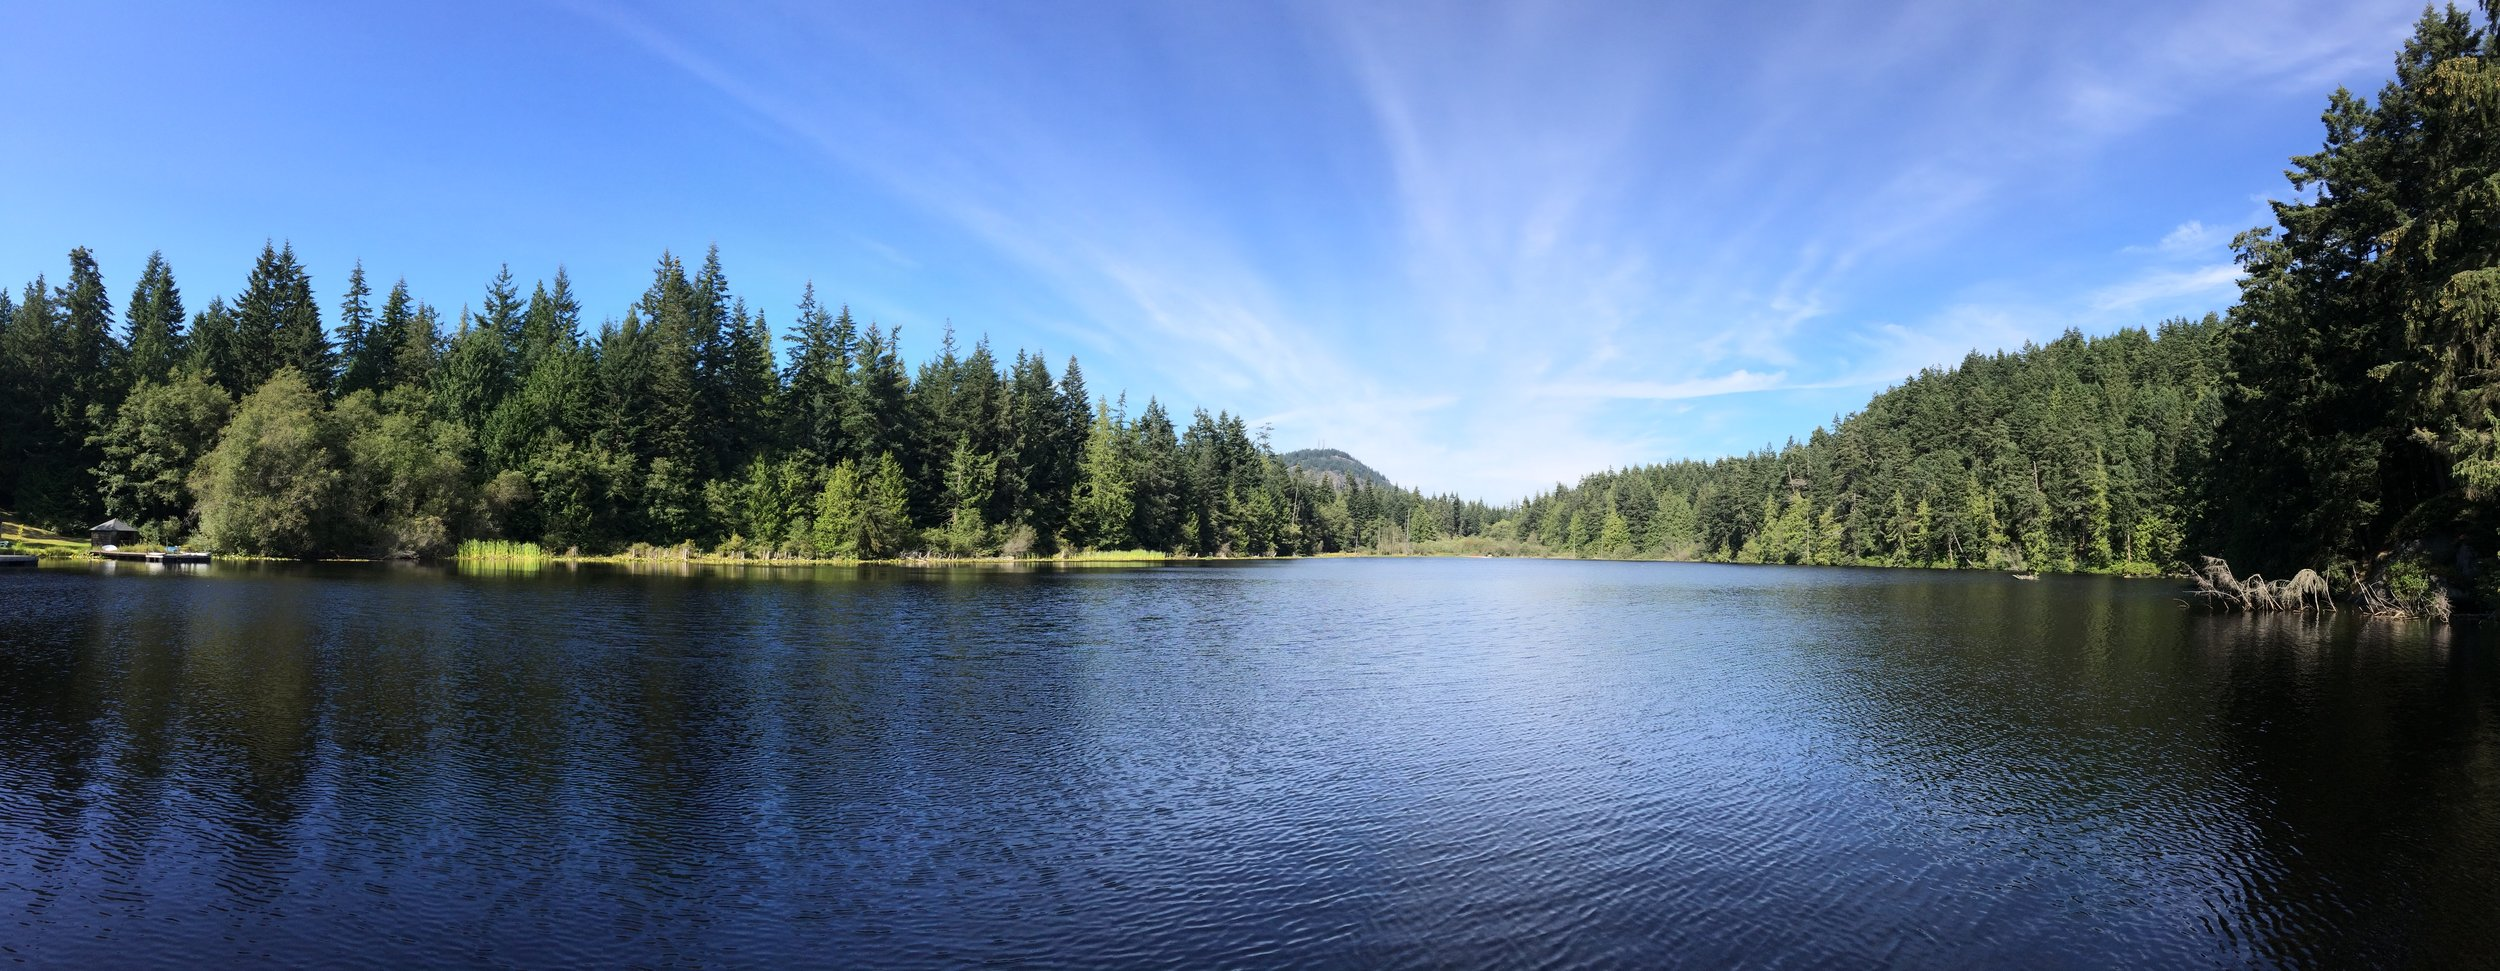 anacortes lake